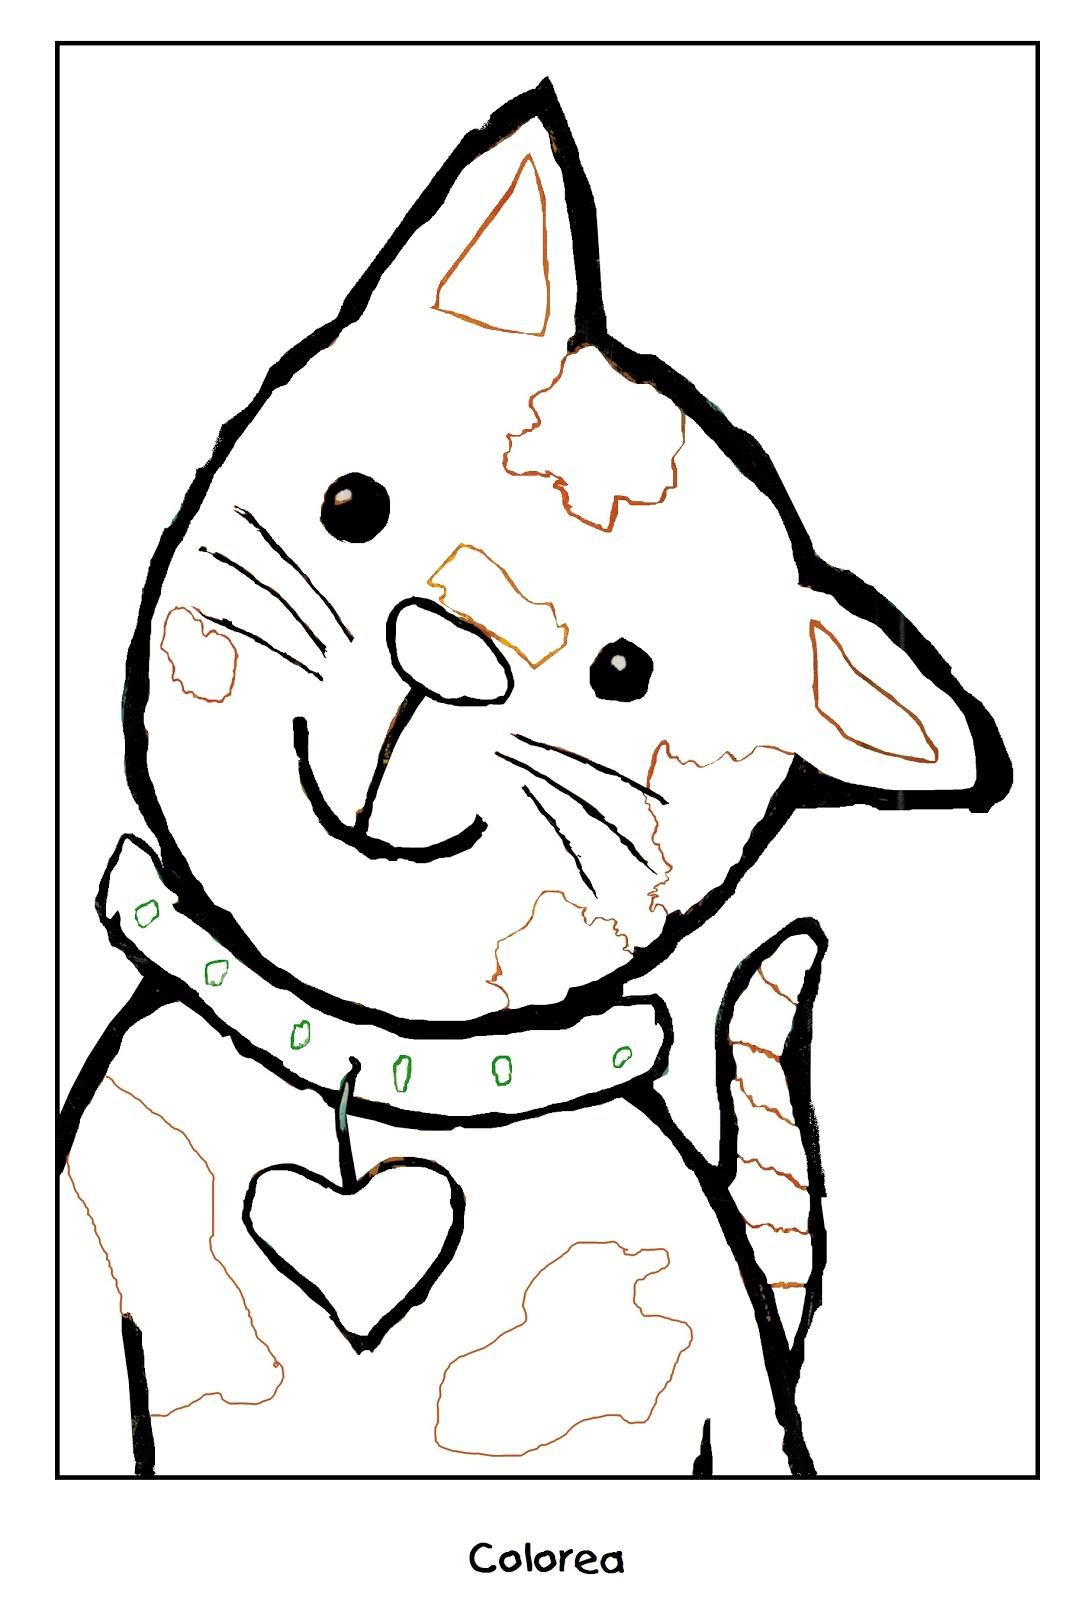 Atractivo Gato Para Colorear Libros Molde - Dibujos Para Colorear En ...